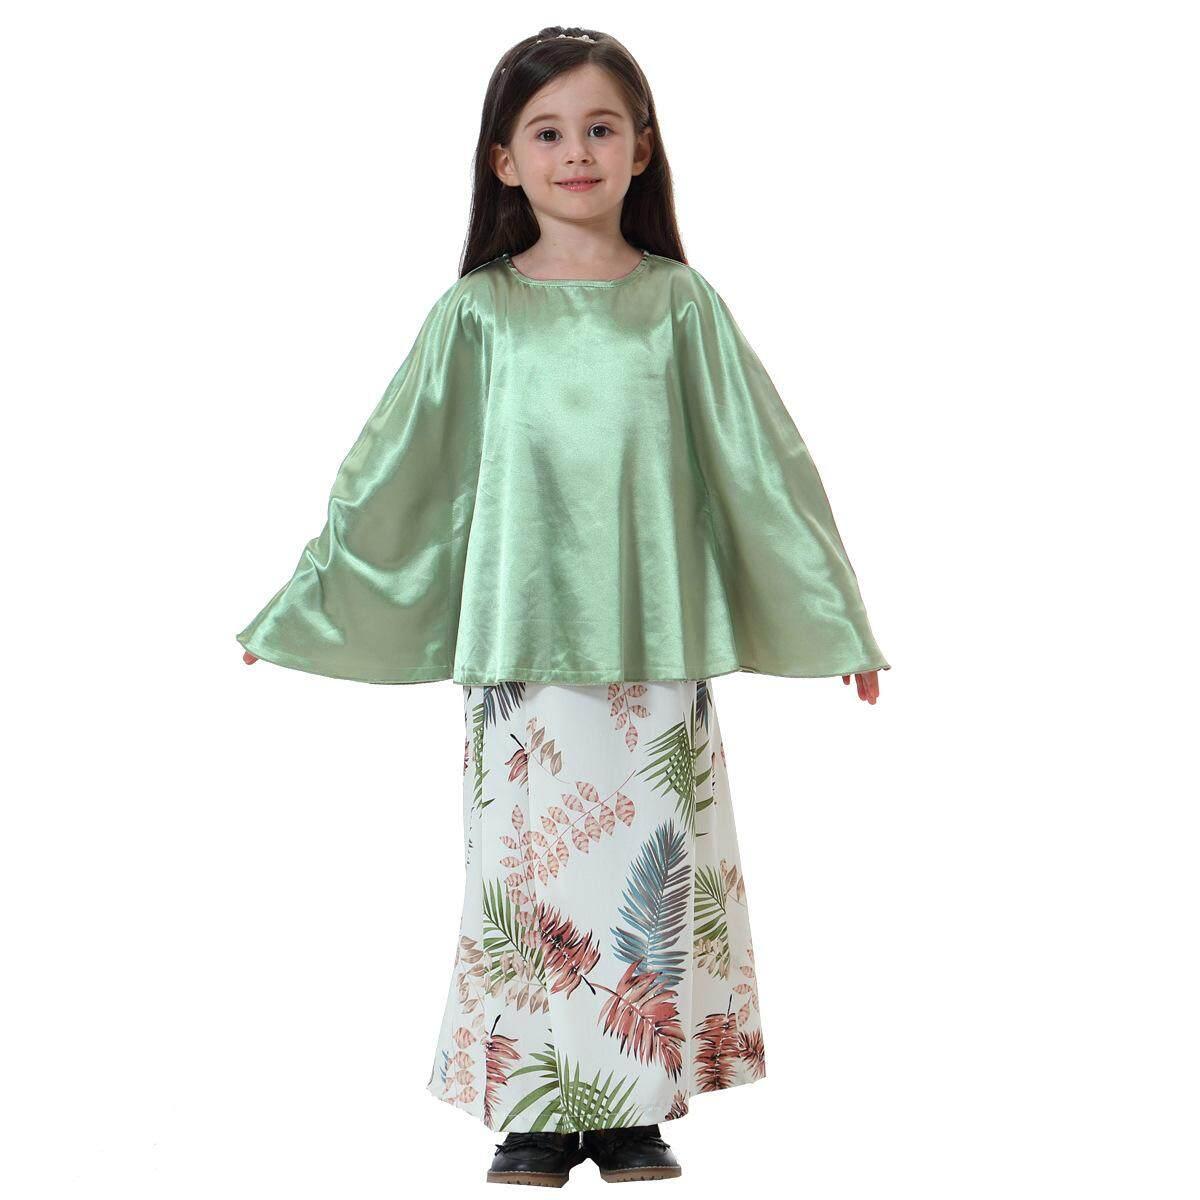 New hot selling Muslim girl long sleeve bat shirt skirt set